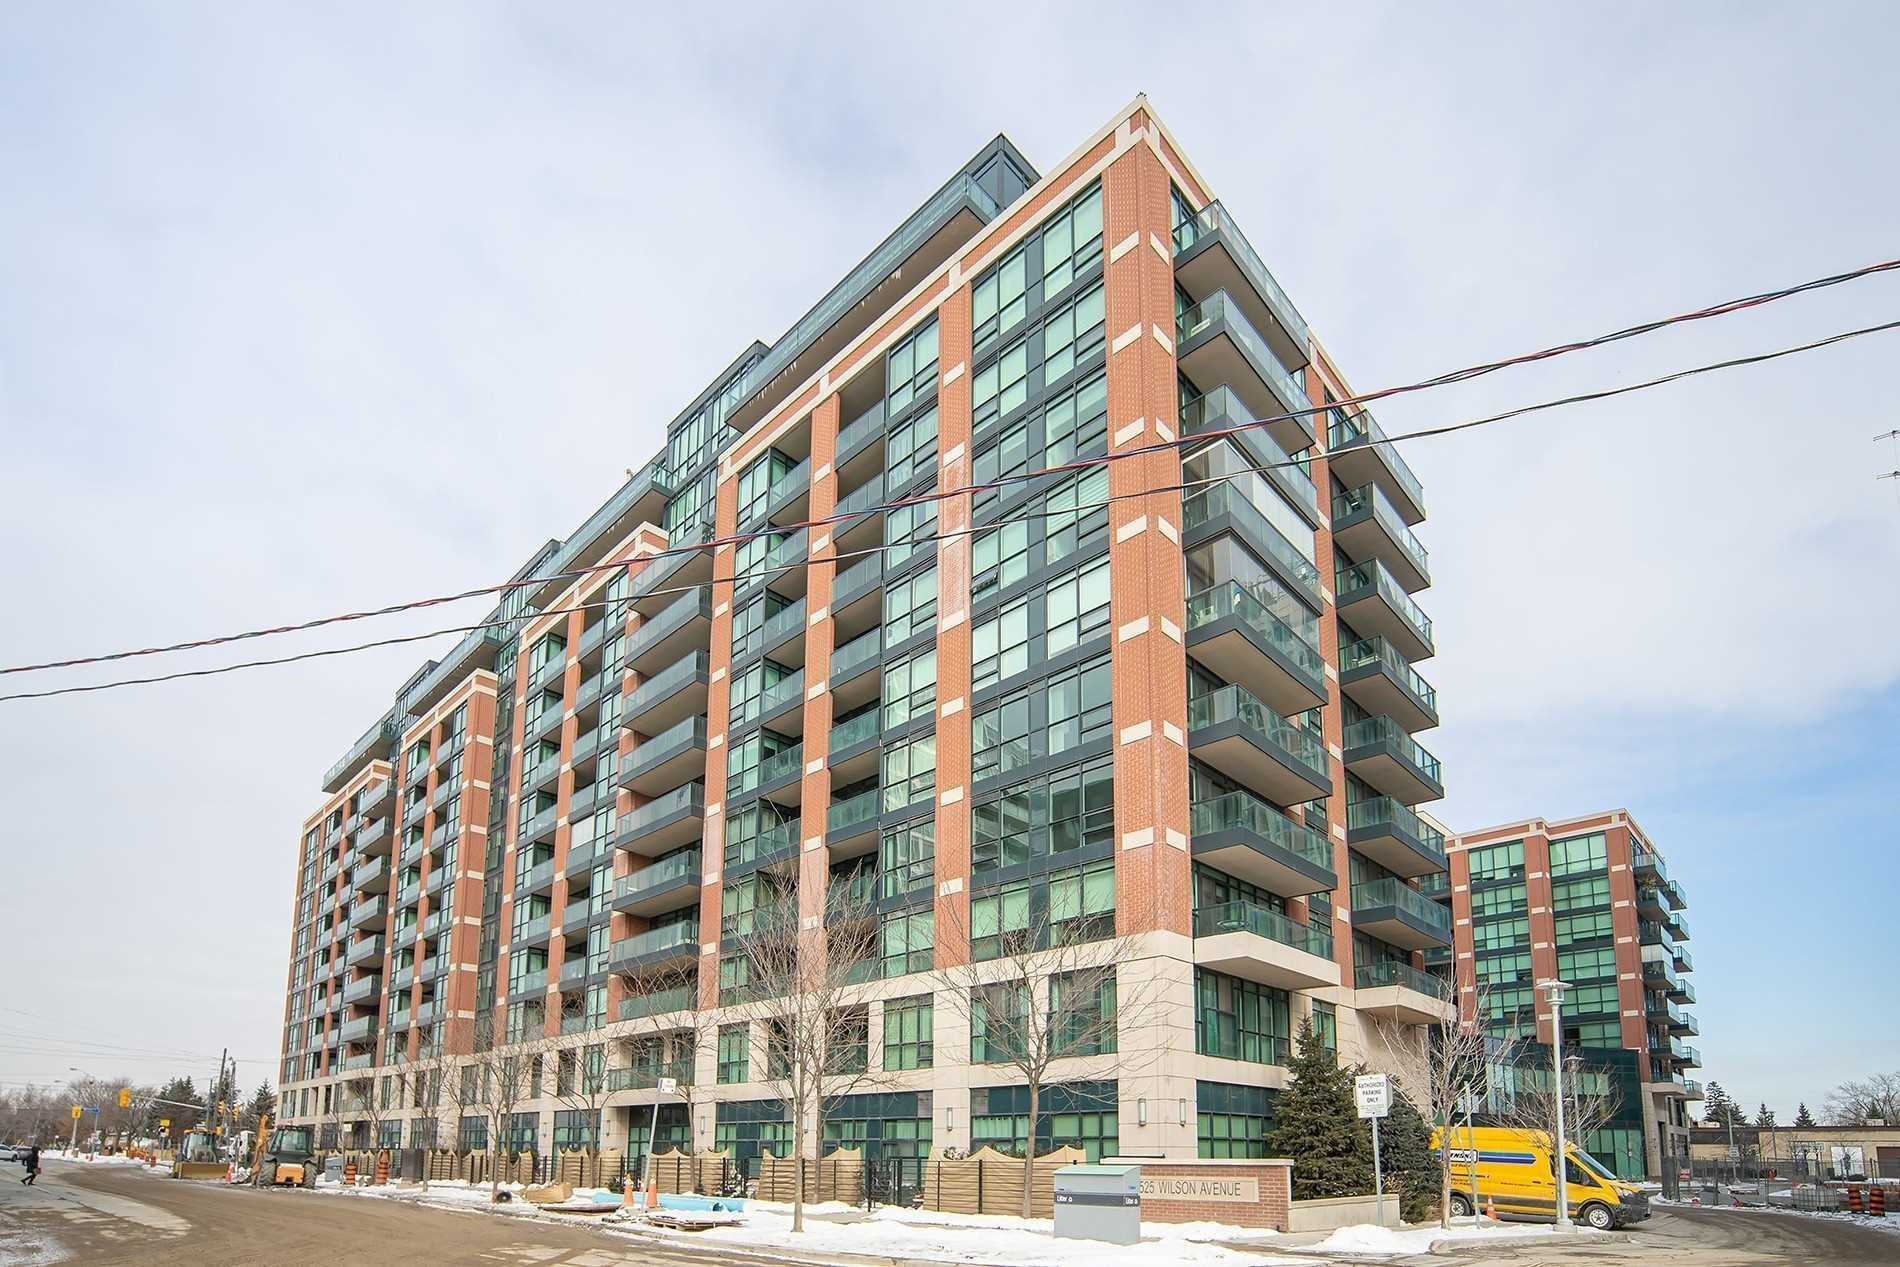 Main Photo: 428 525 Wilson Avenue in Toronto: Clanton Park Condo for lease (Toronto C06)  : MLS®# C4754904